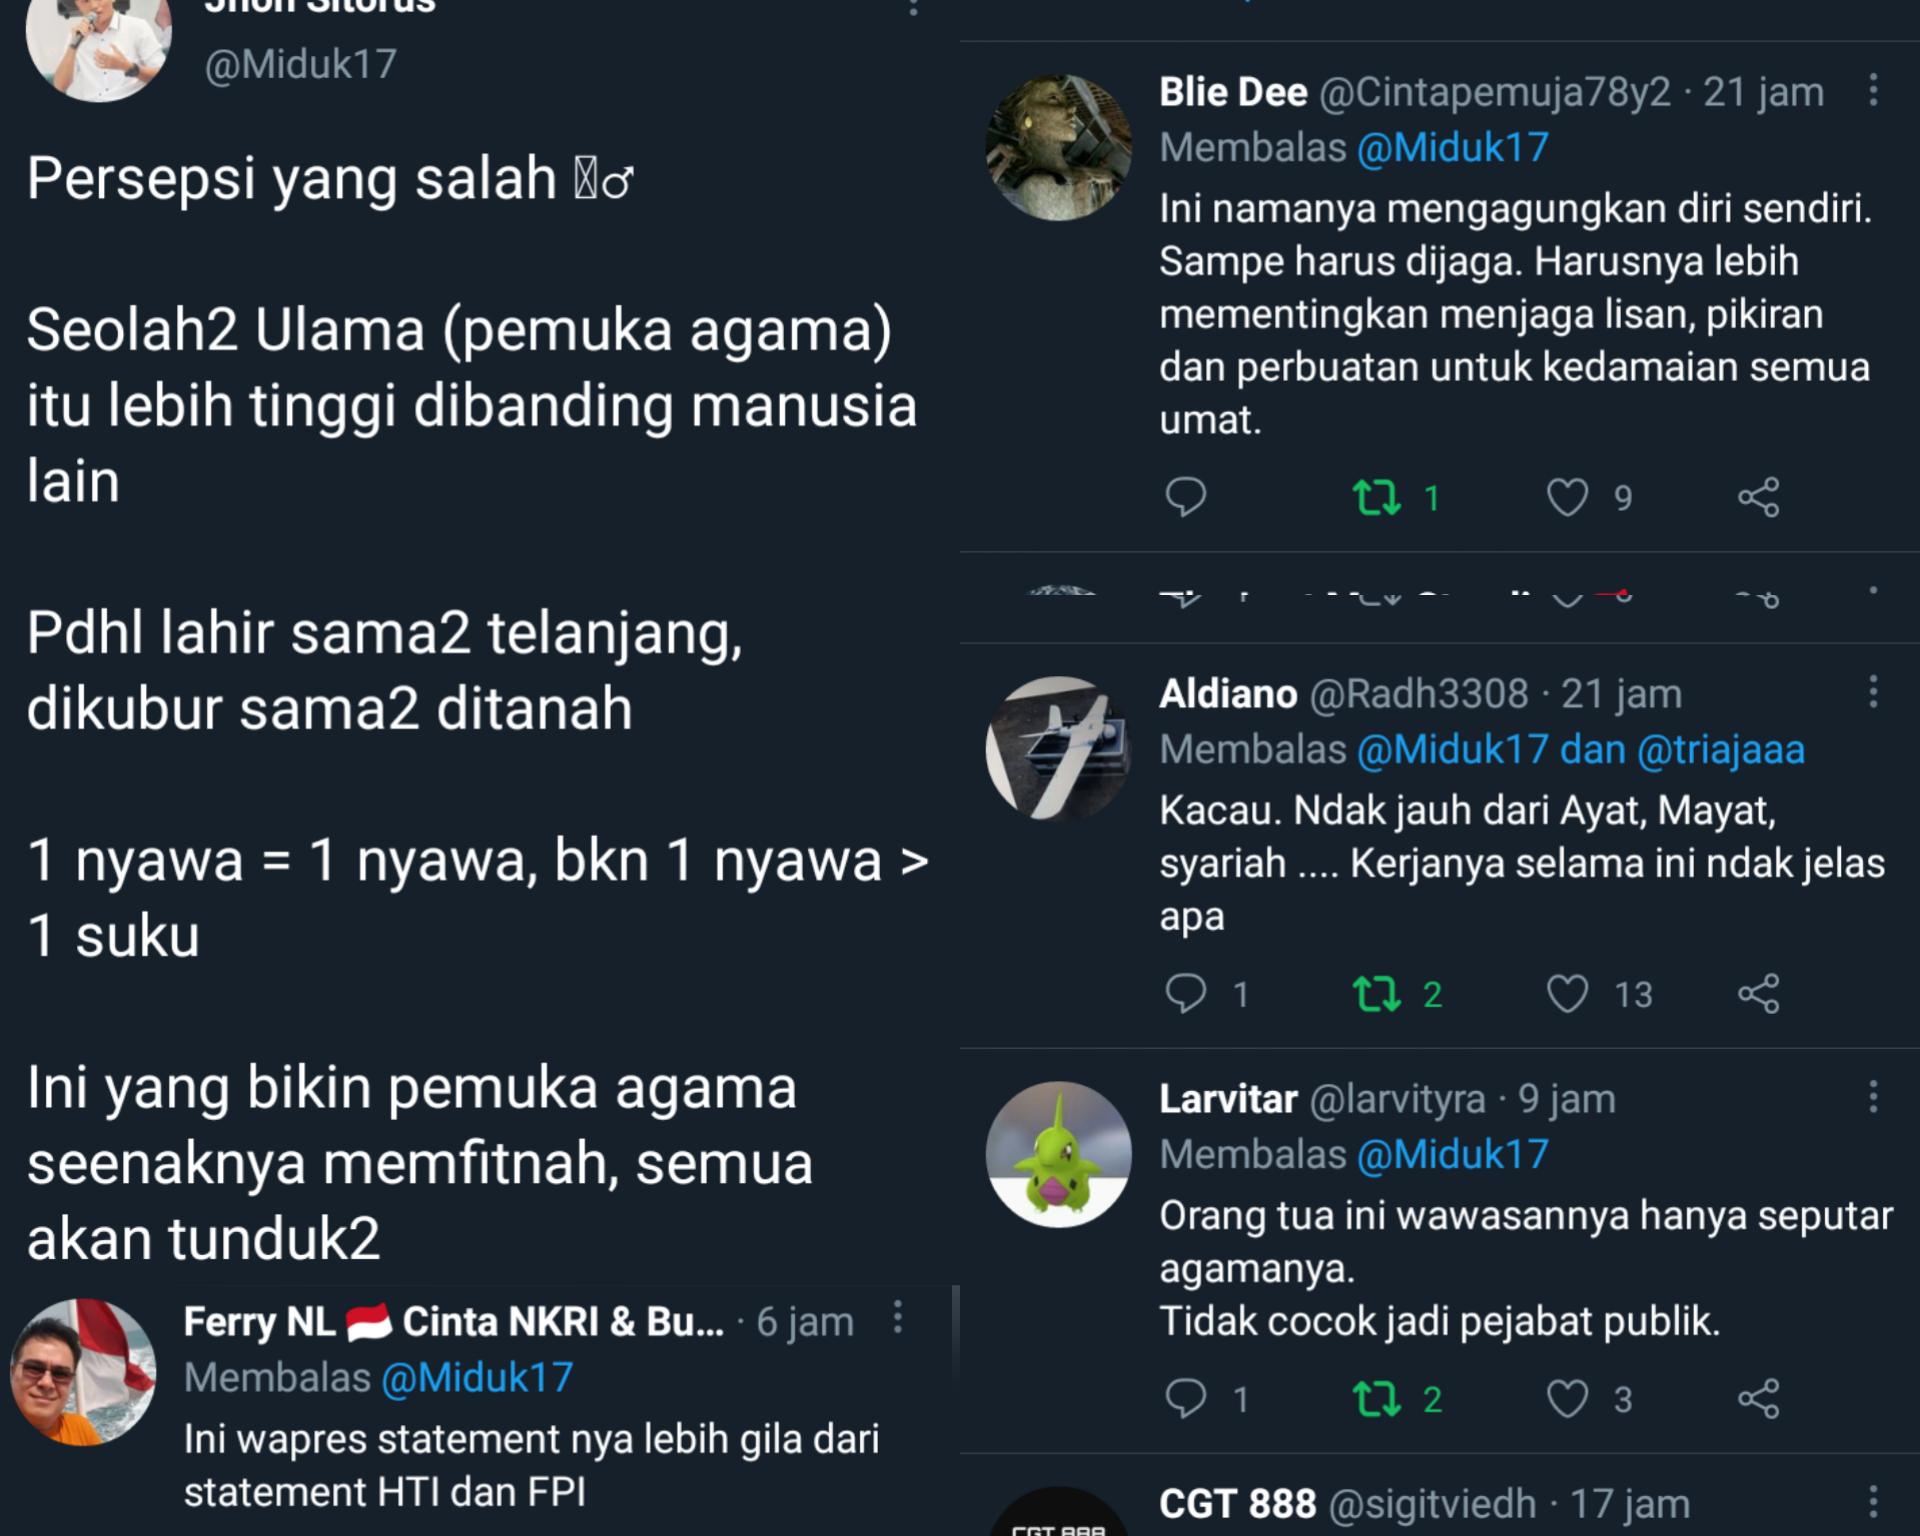 Netizen Kecam Pernyataan Ma'ruf Amin Soal Ini: Lebih Parah dari Statement FPI & HTI!